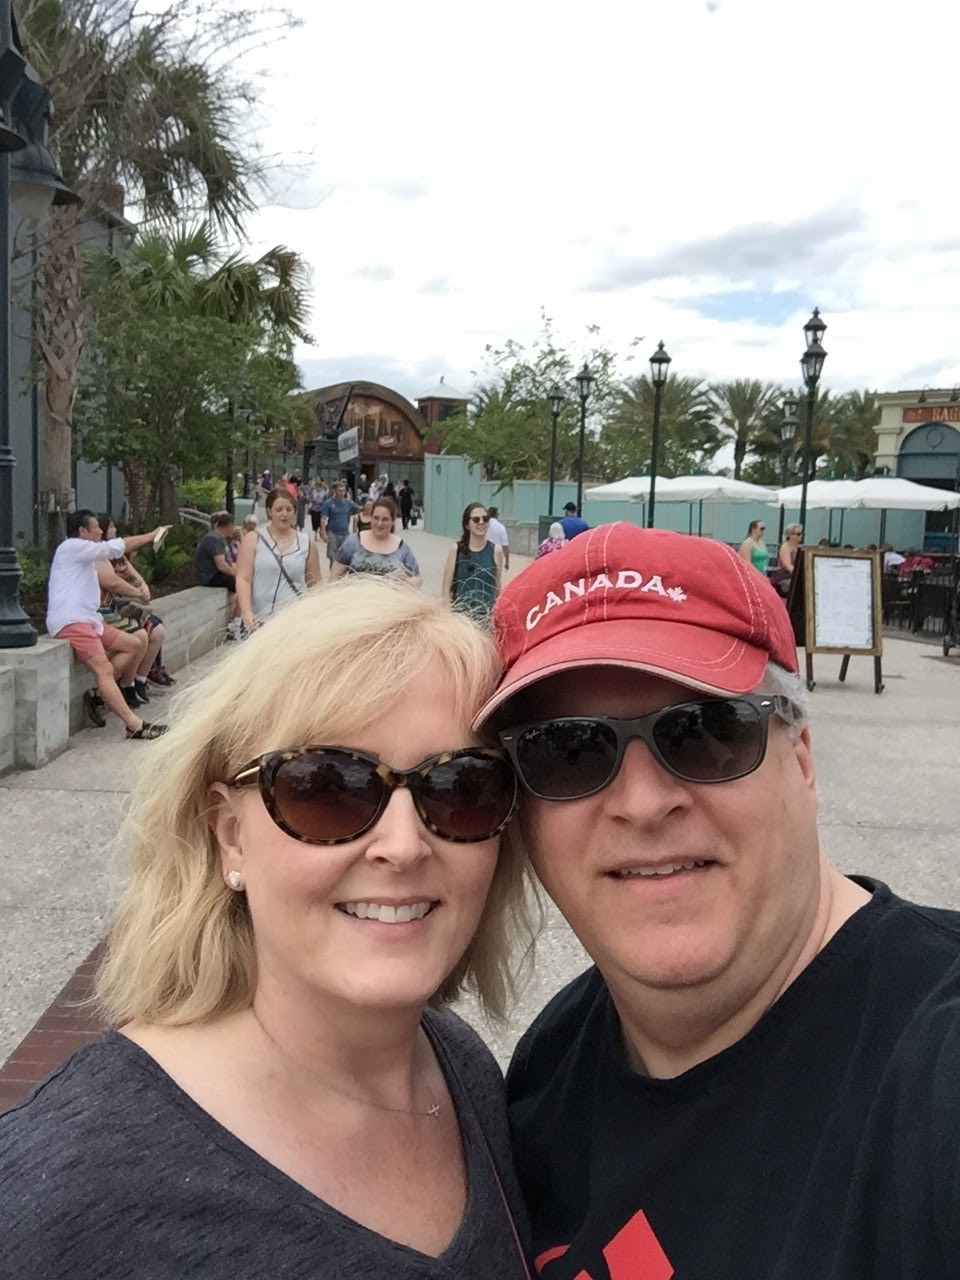 The Tarkins at Disney Springs!